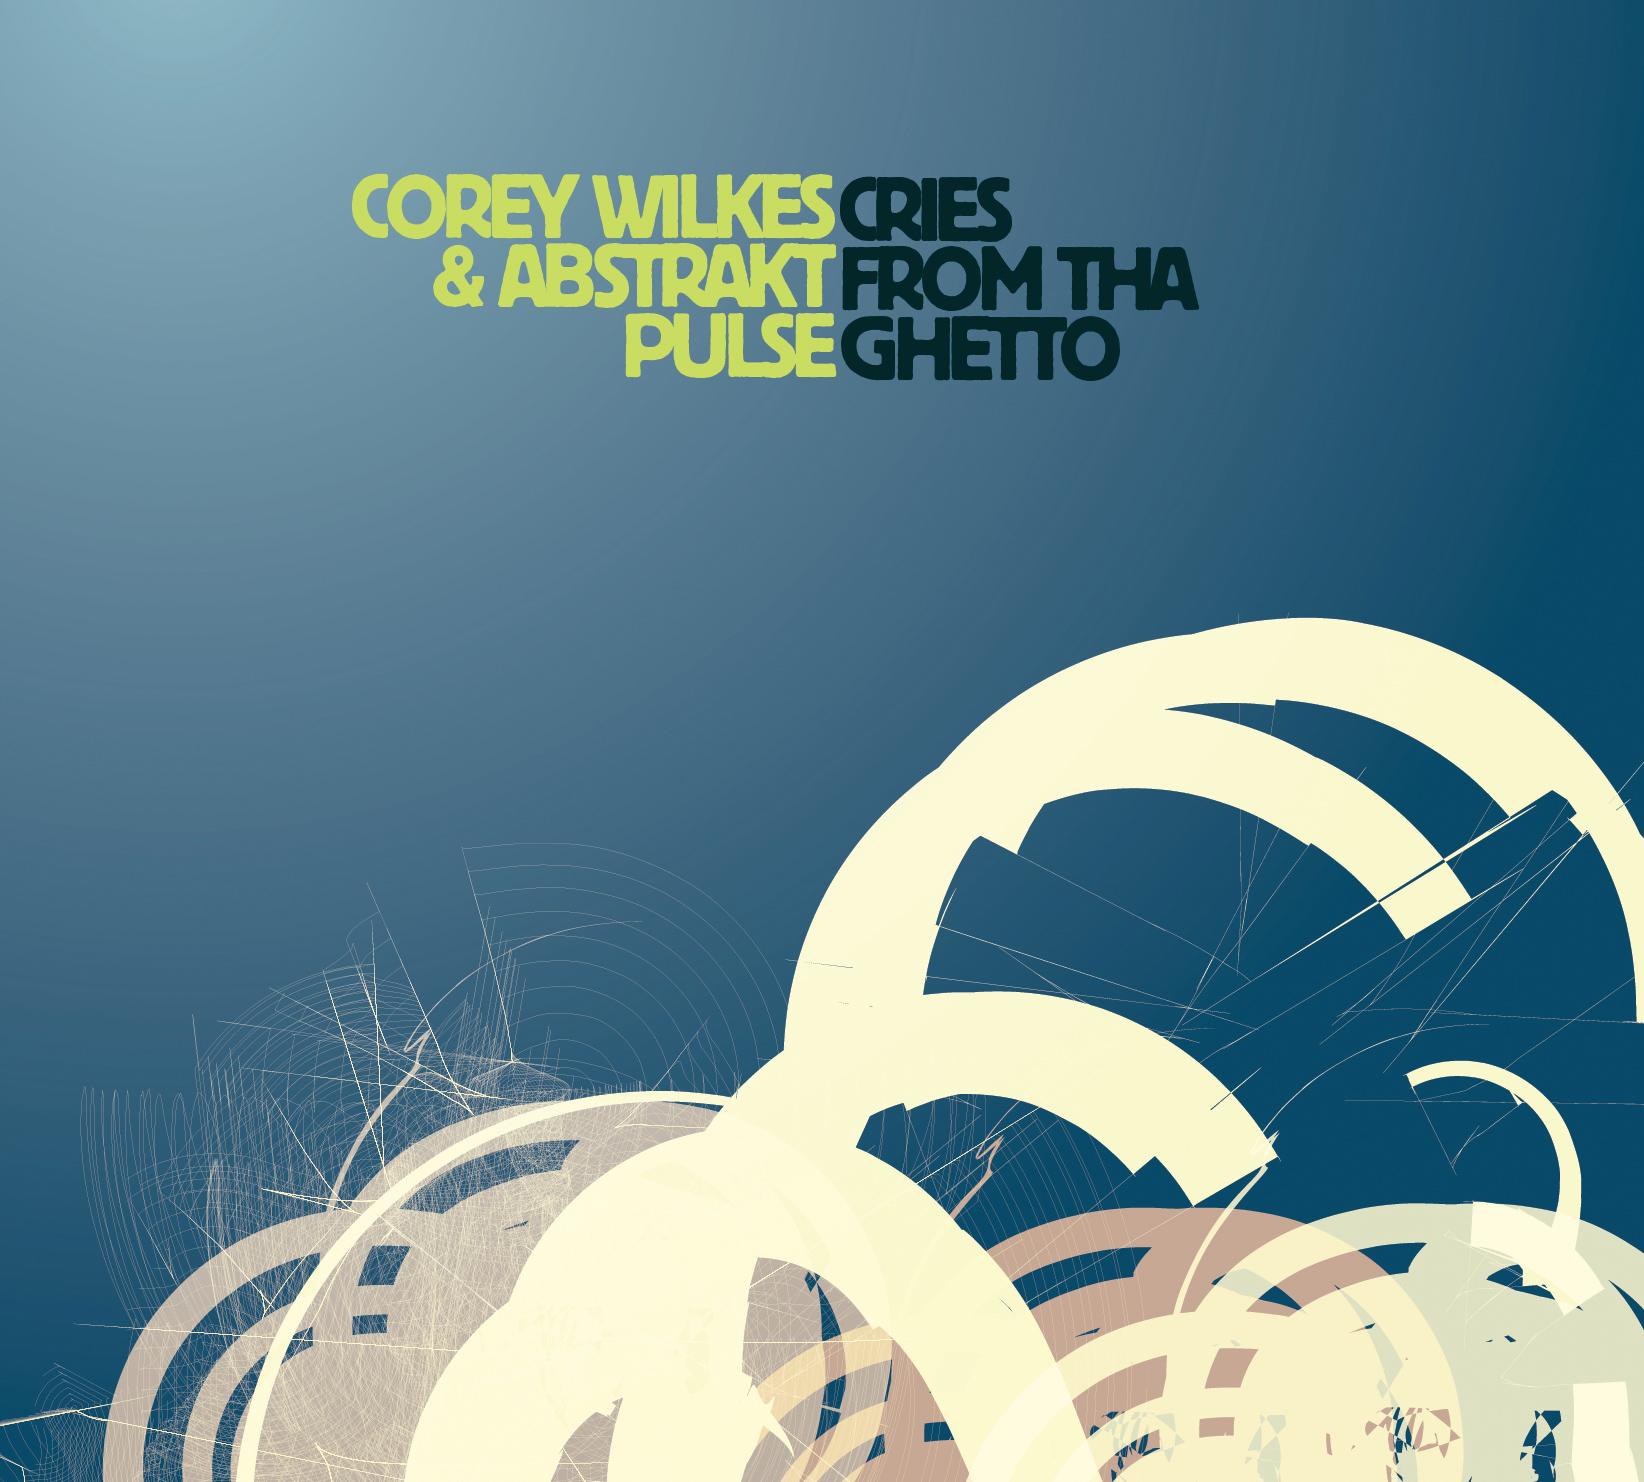 Cries from tha Ghetto - Corey Wilkes & Abstrakt Pulse